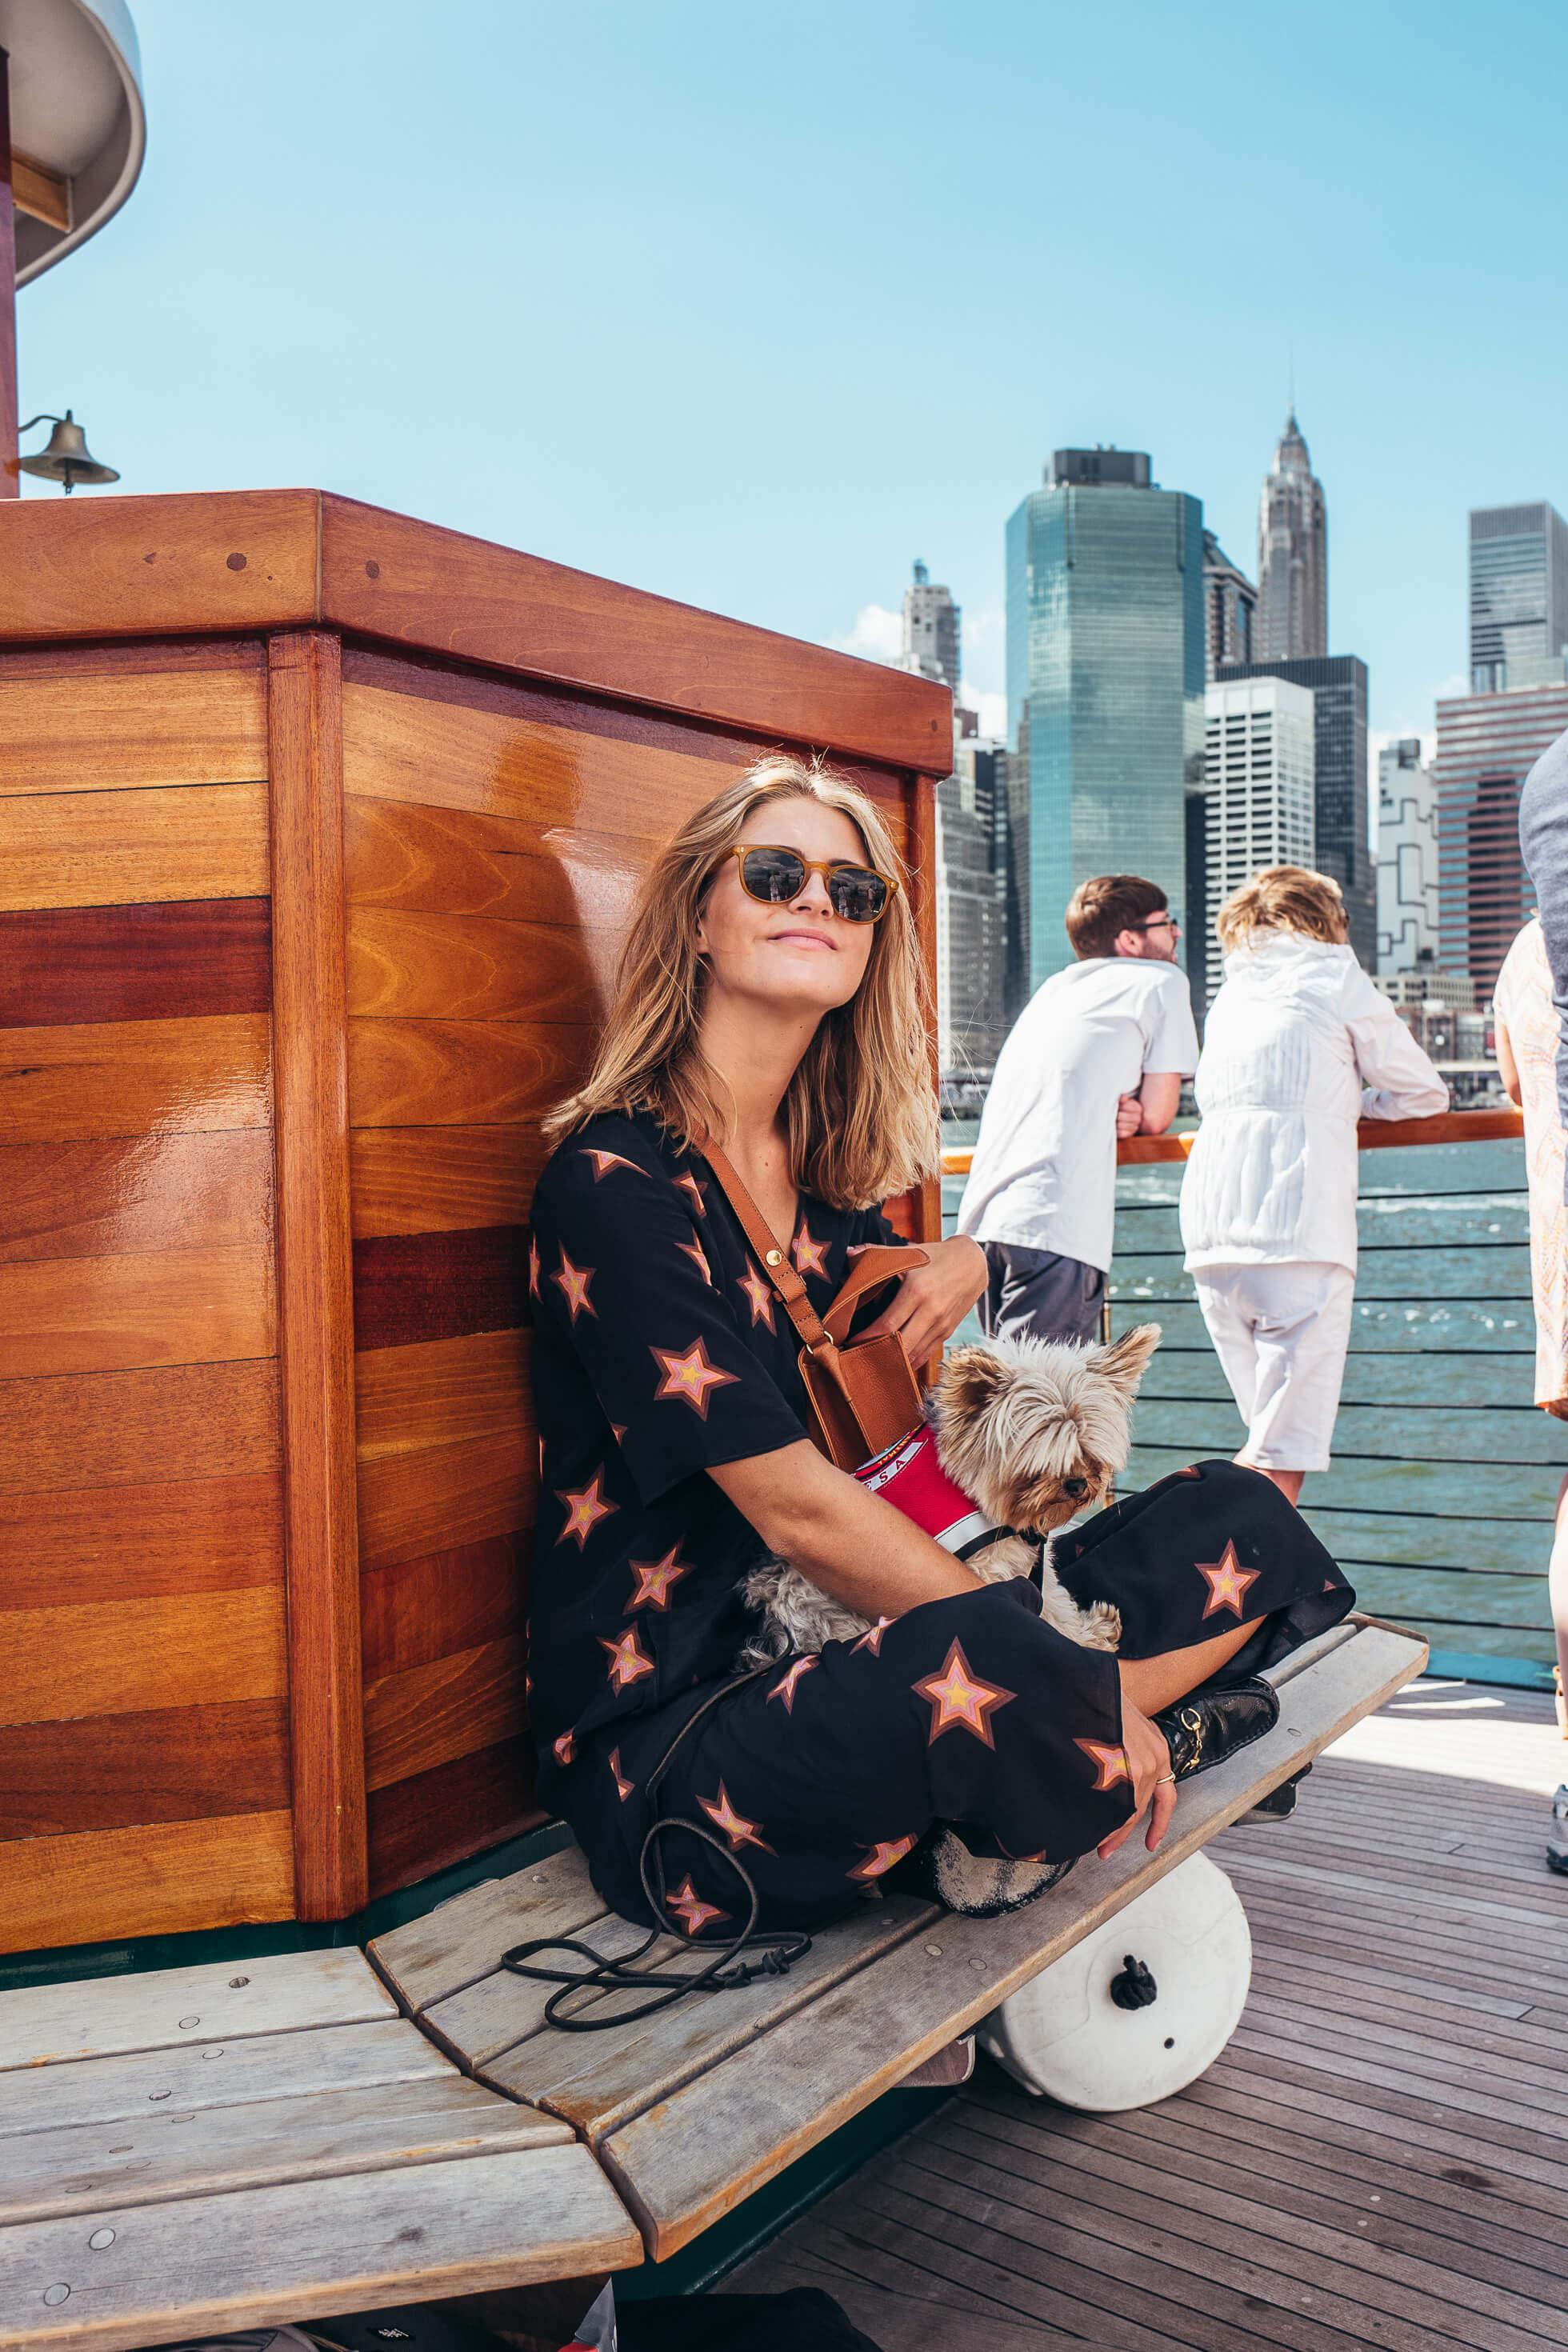 janni-deler-new-york-tour-boatL1090461